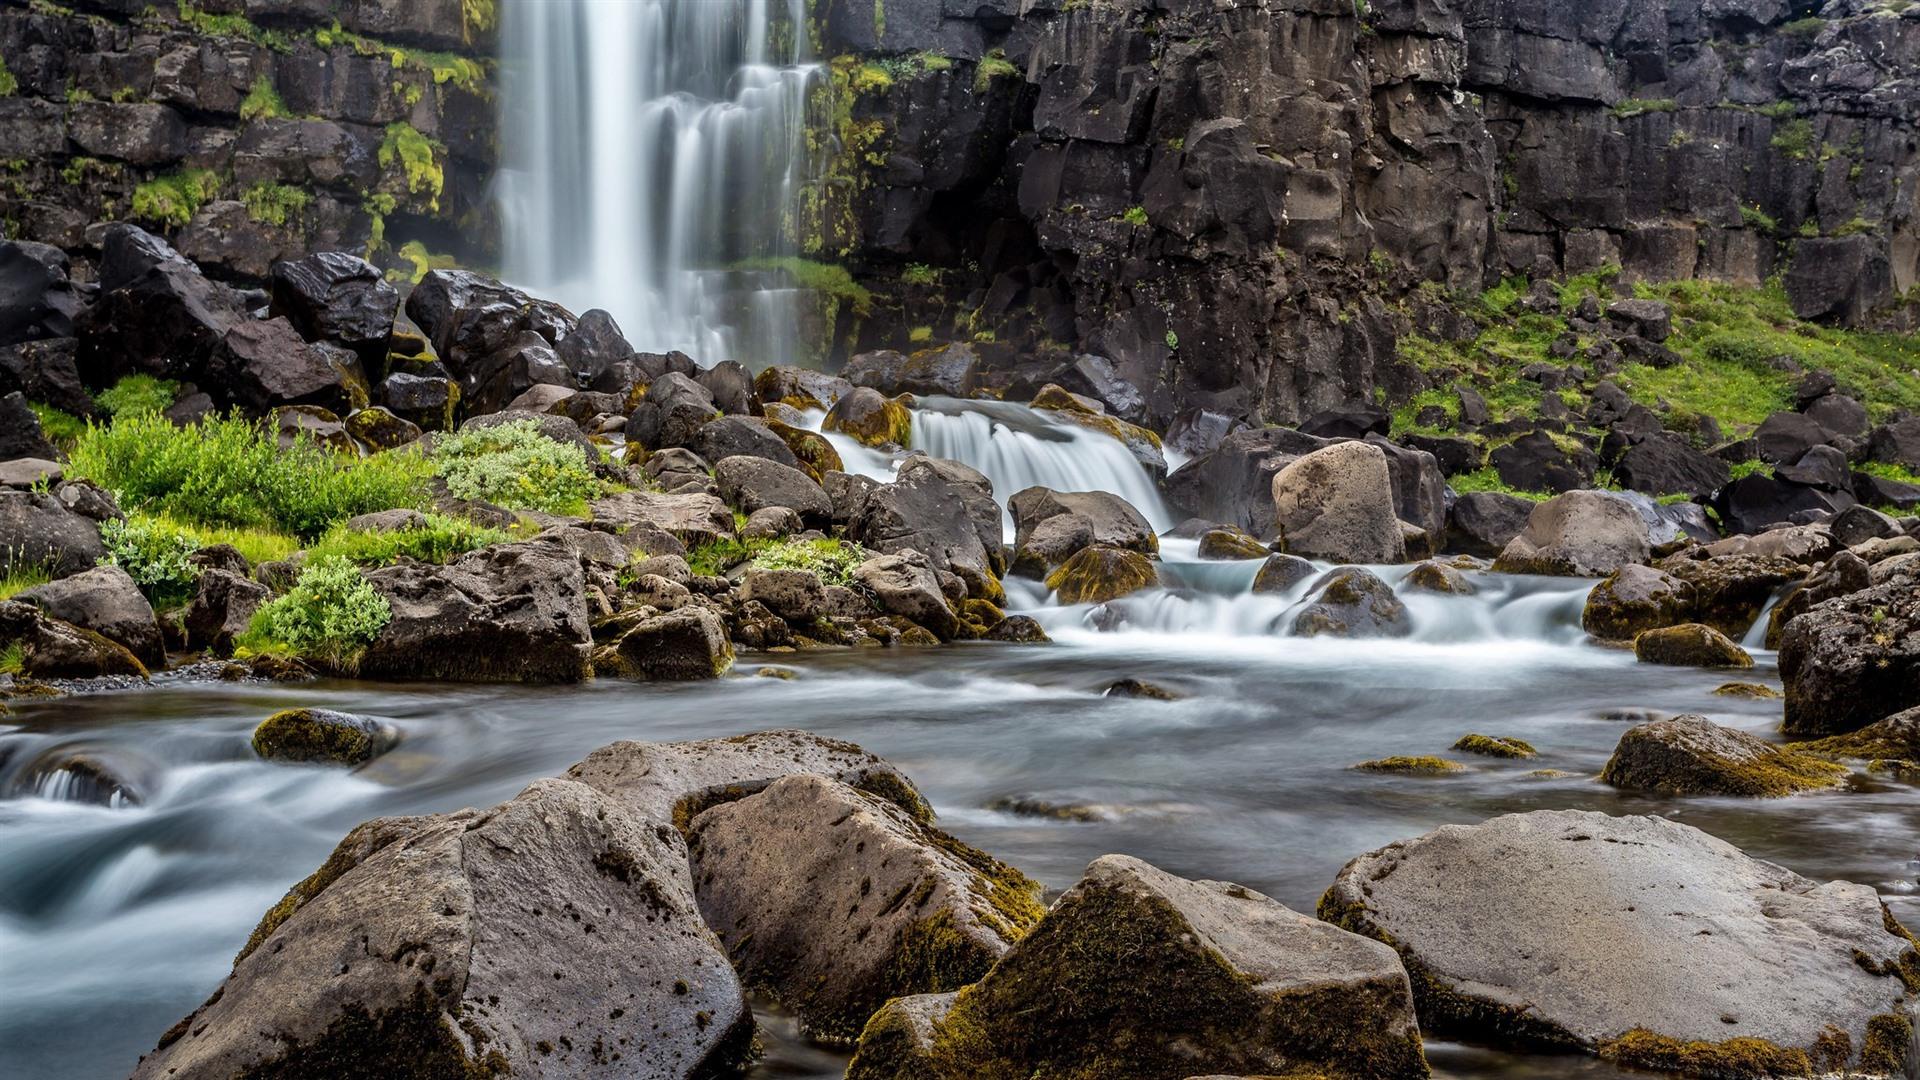 Wallpaper Stones Rocks Water Waterfall 1920x1200 Hd